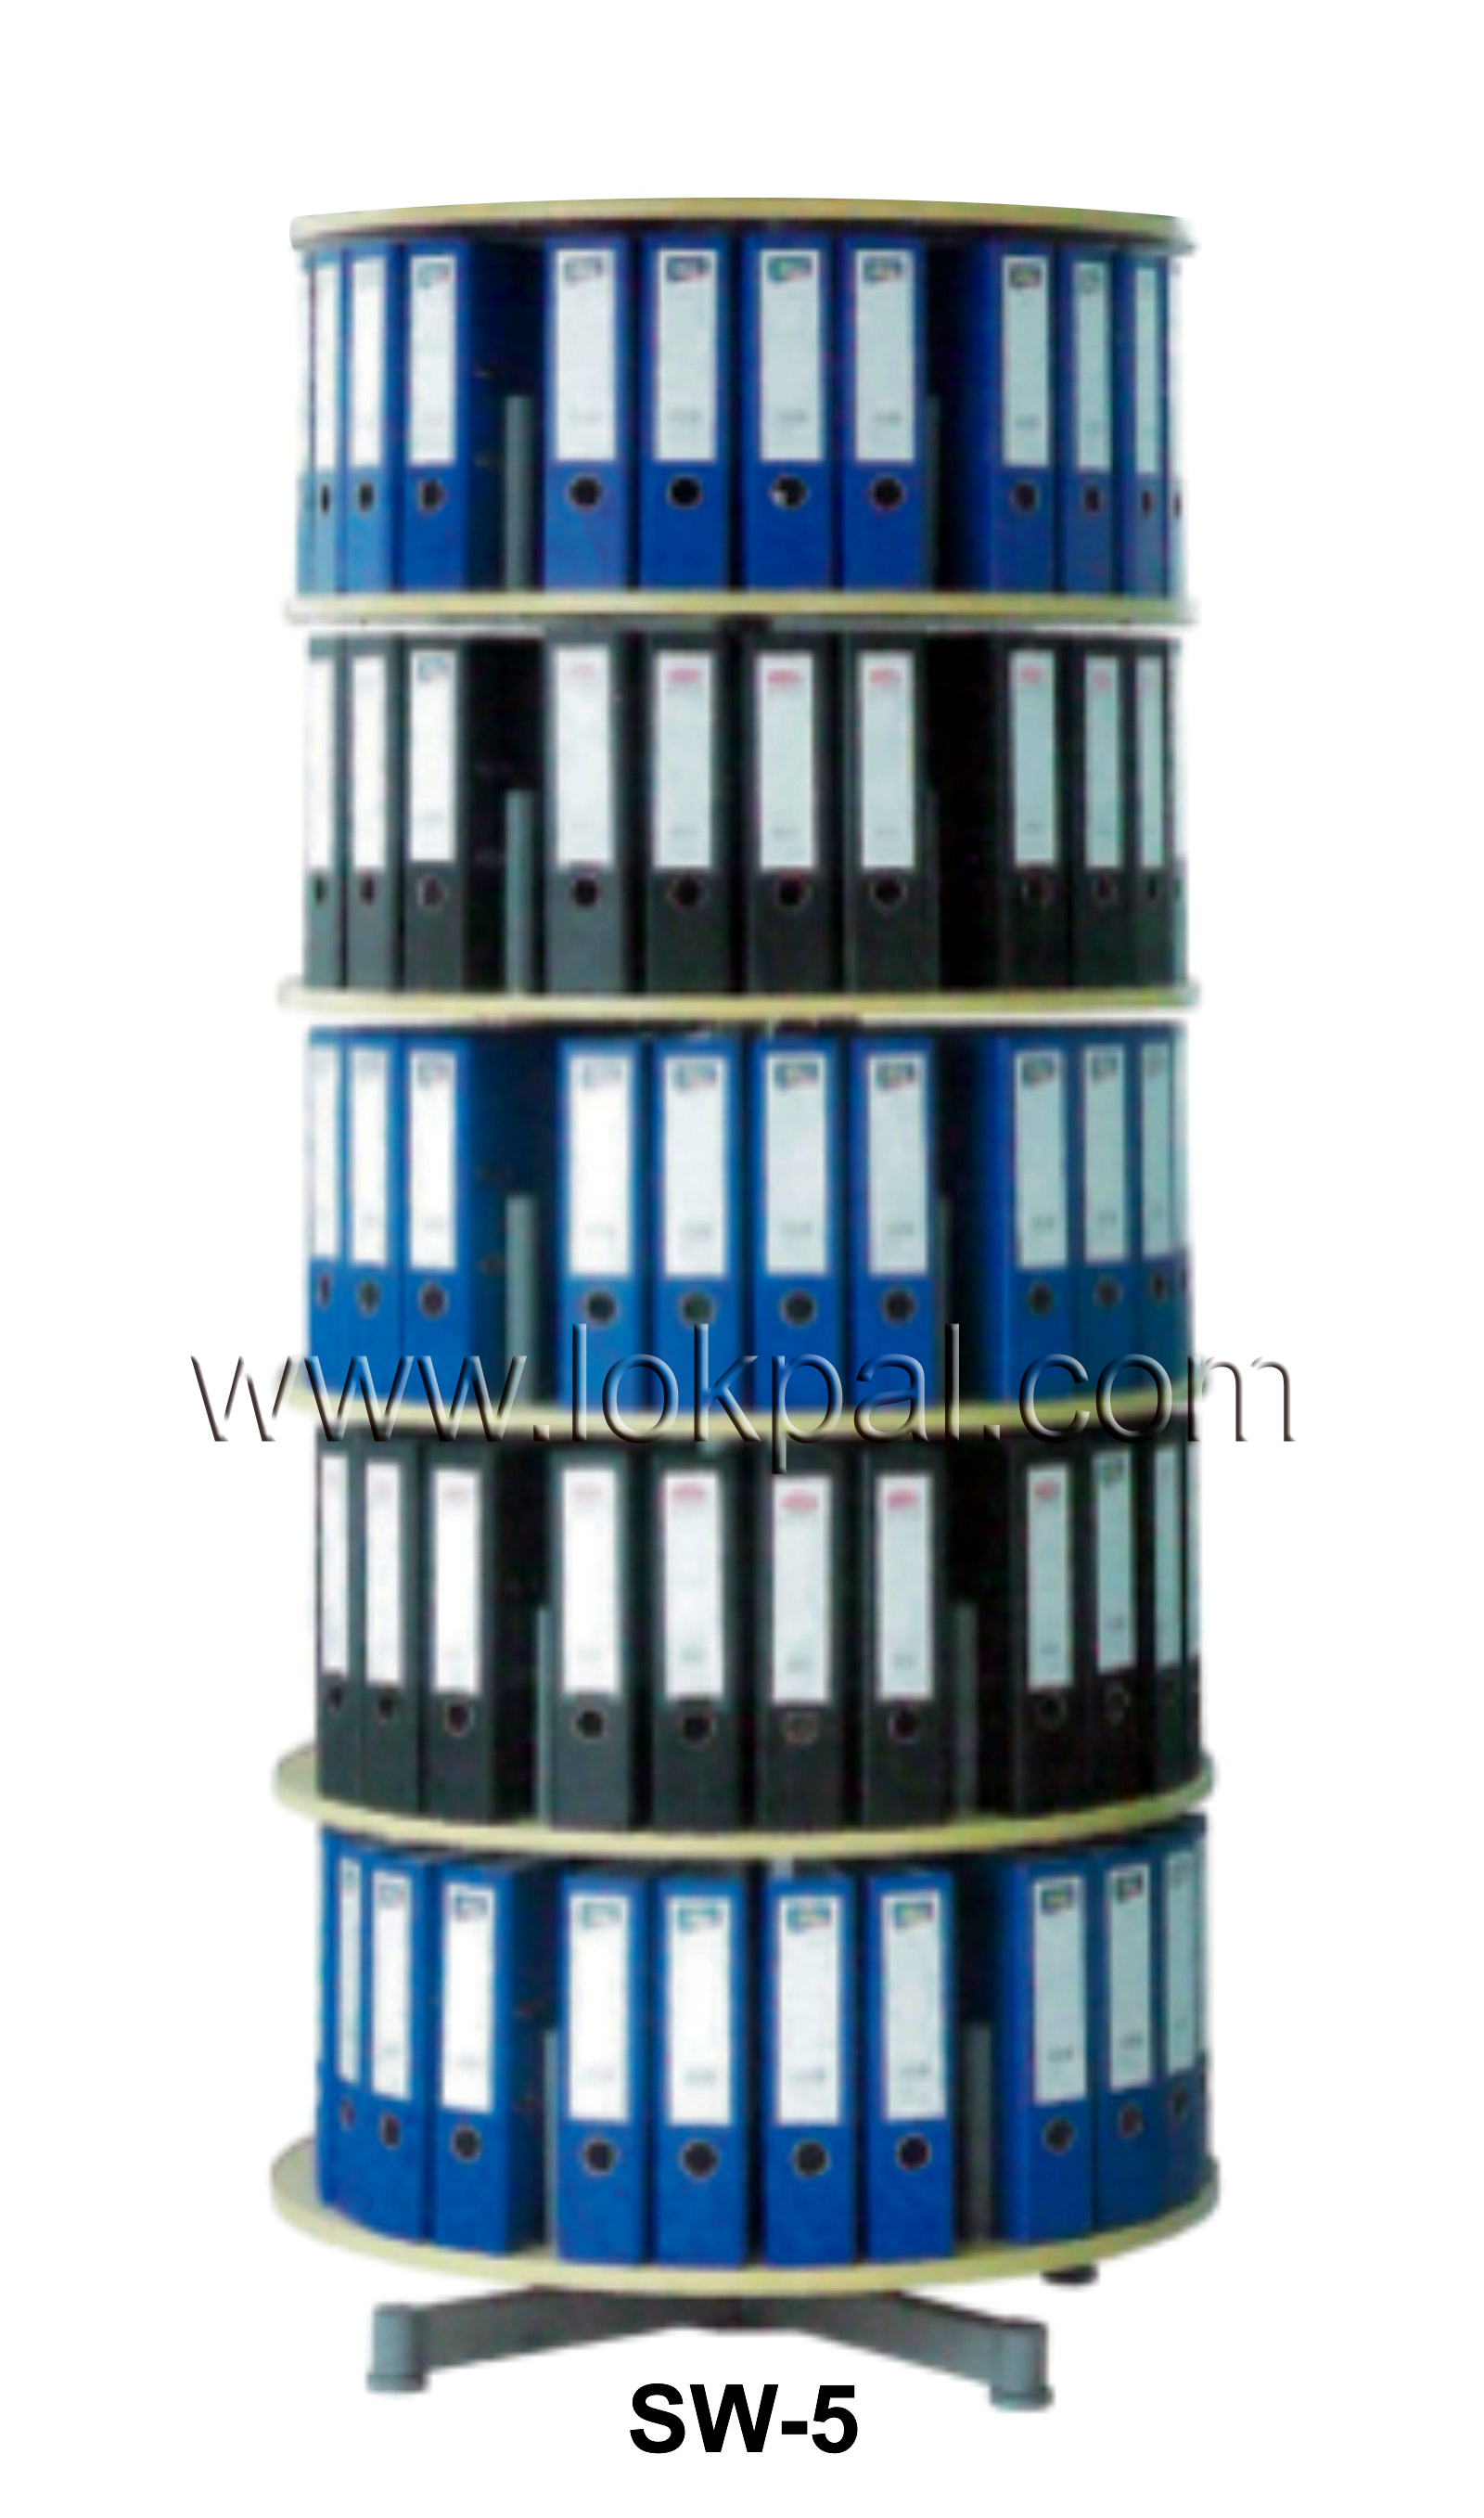 Rotary File Racks, Rotary File Rack Manufacturer, File Racks Suppliers,  Delhi NCR,